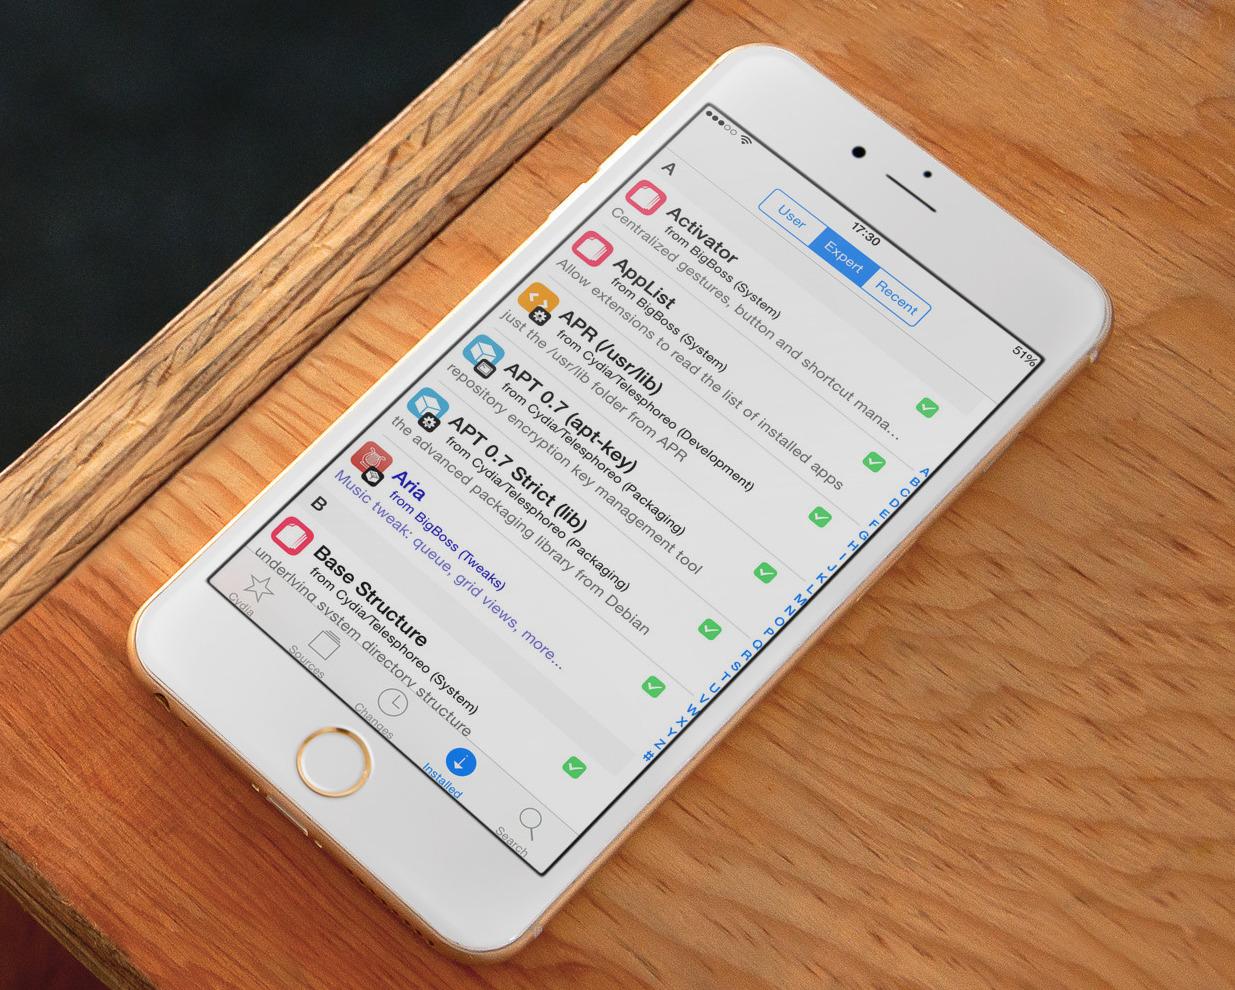 Cydia-Expert-mode-iPhone-6